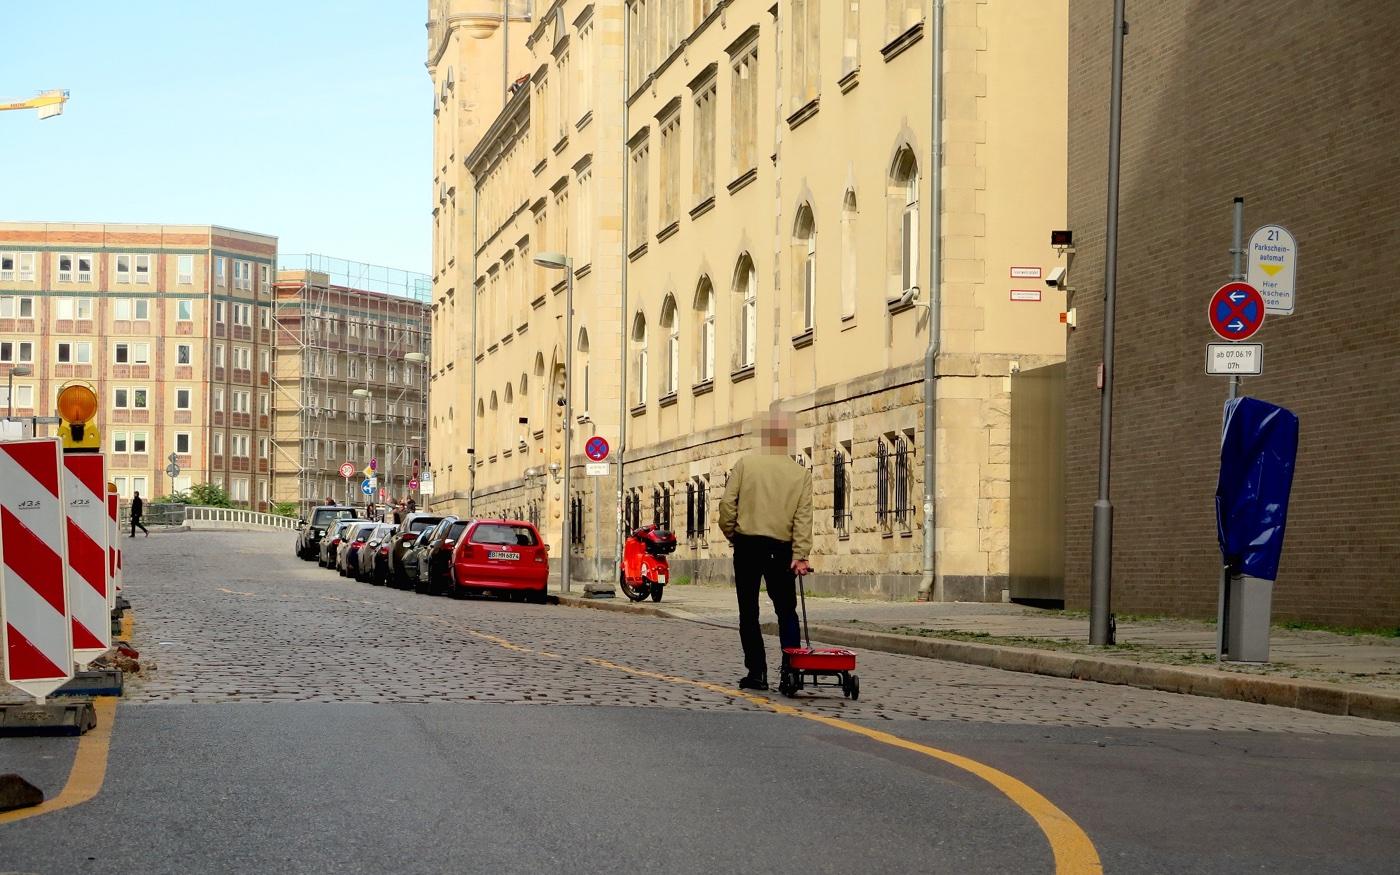 red-handcart-1400.jpg